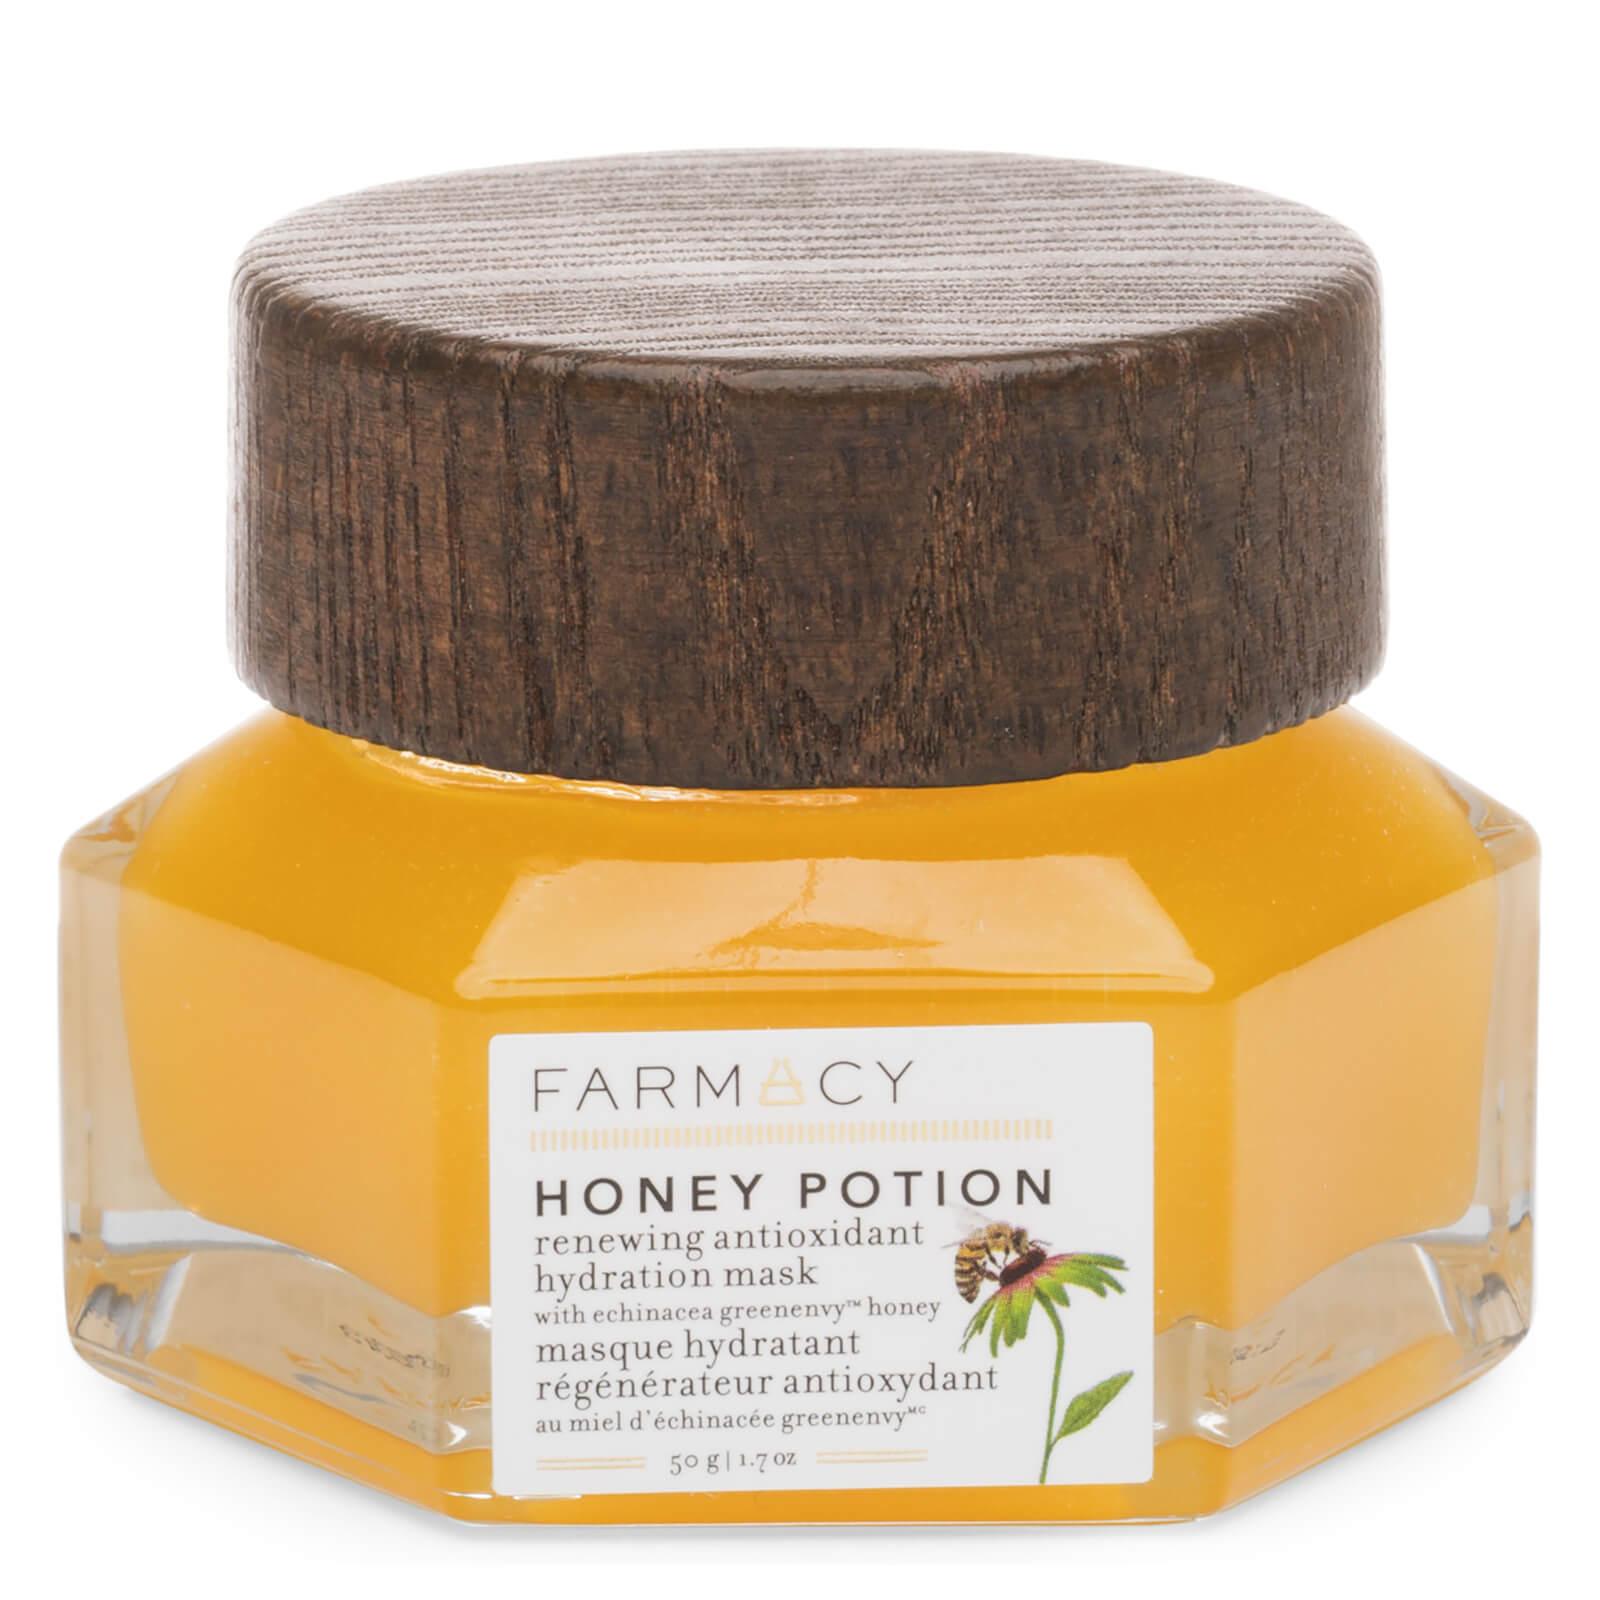 FARMACY 蜂蜜焕彩补水面膜 50g